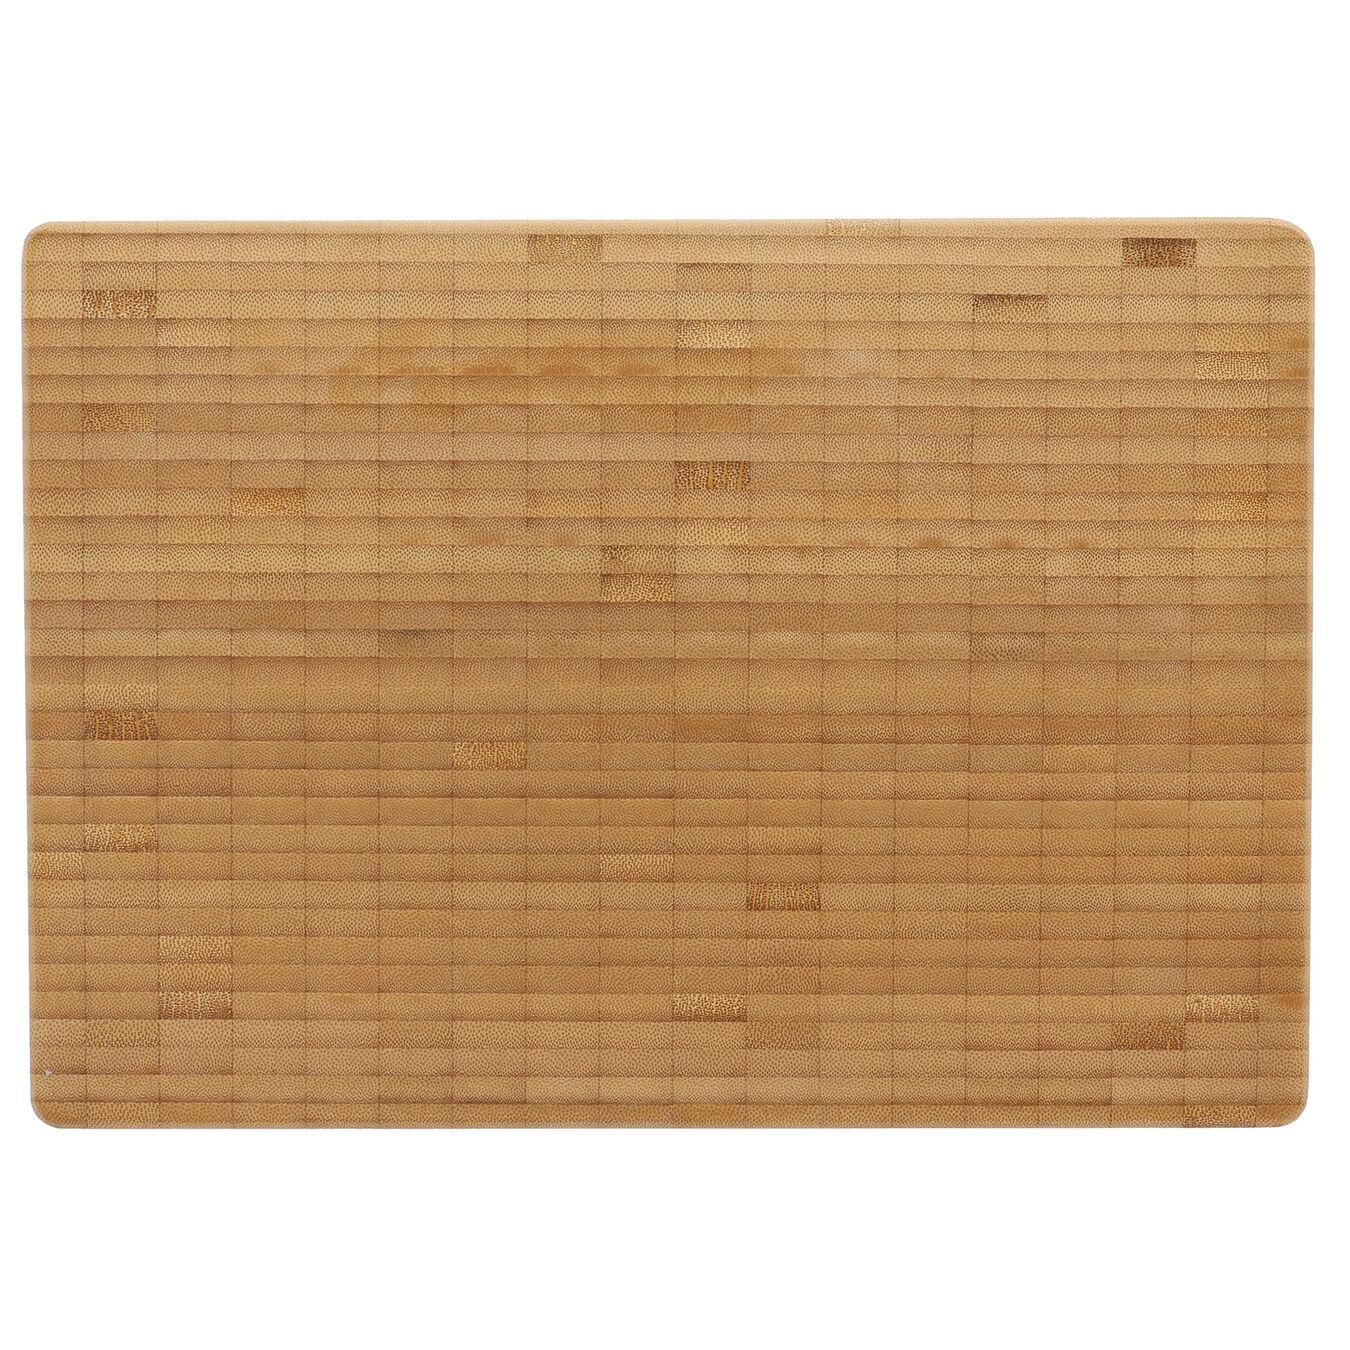 Tagliere - 36 cm x 25 cm, bamb,,large 6